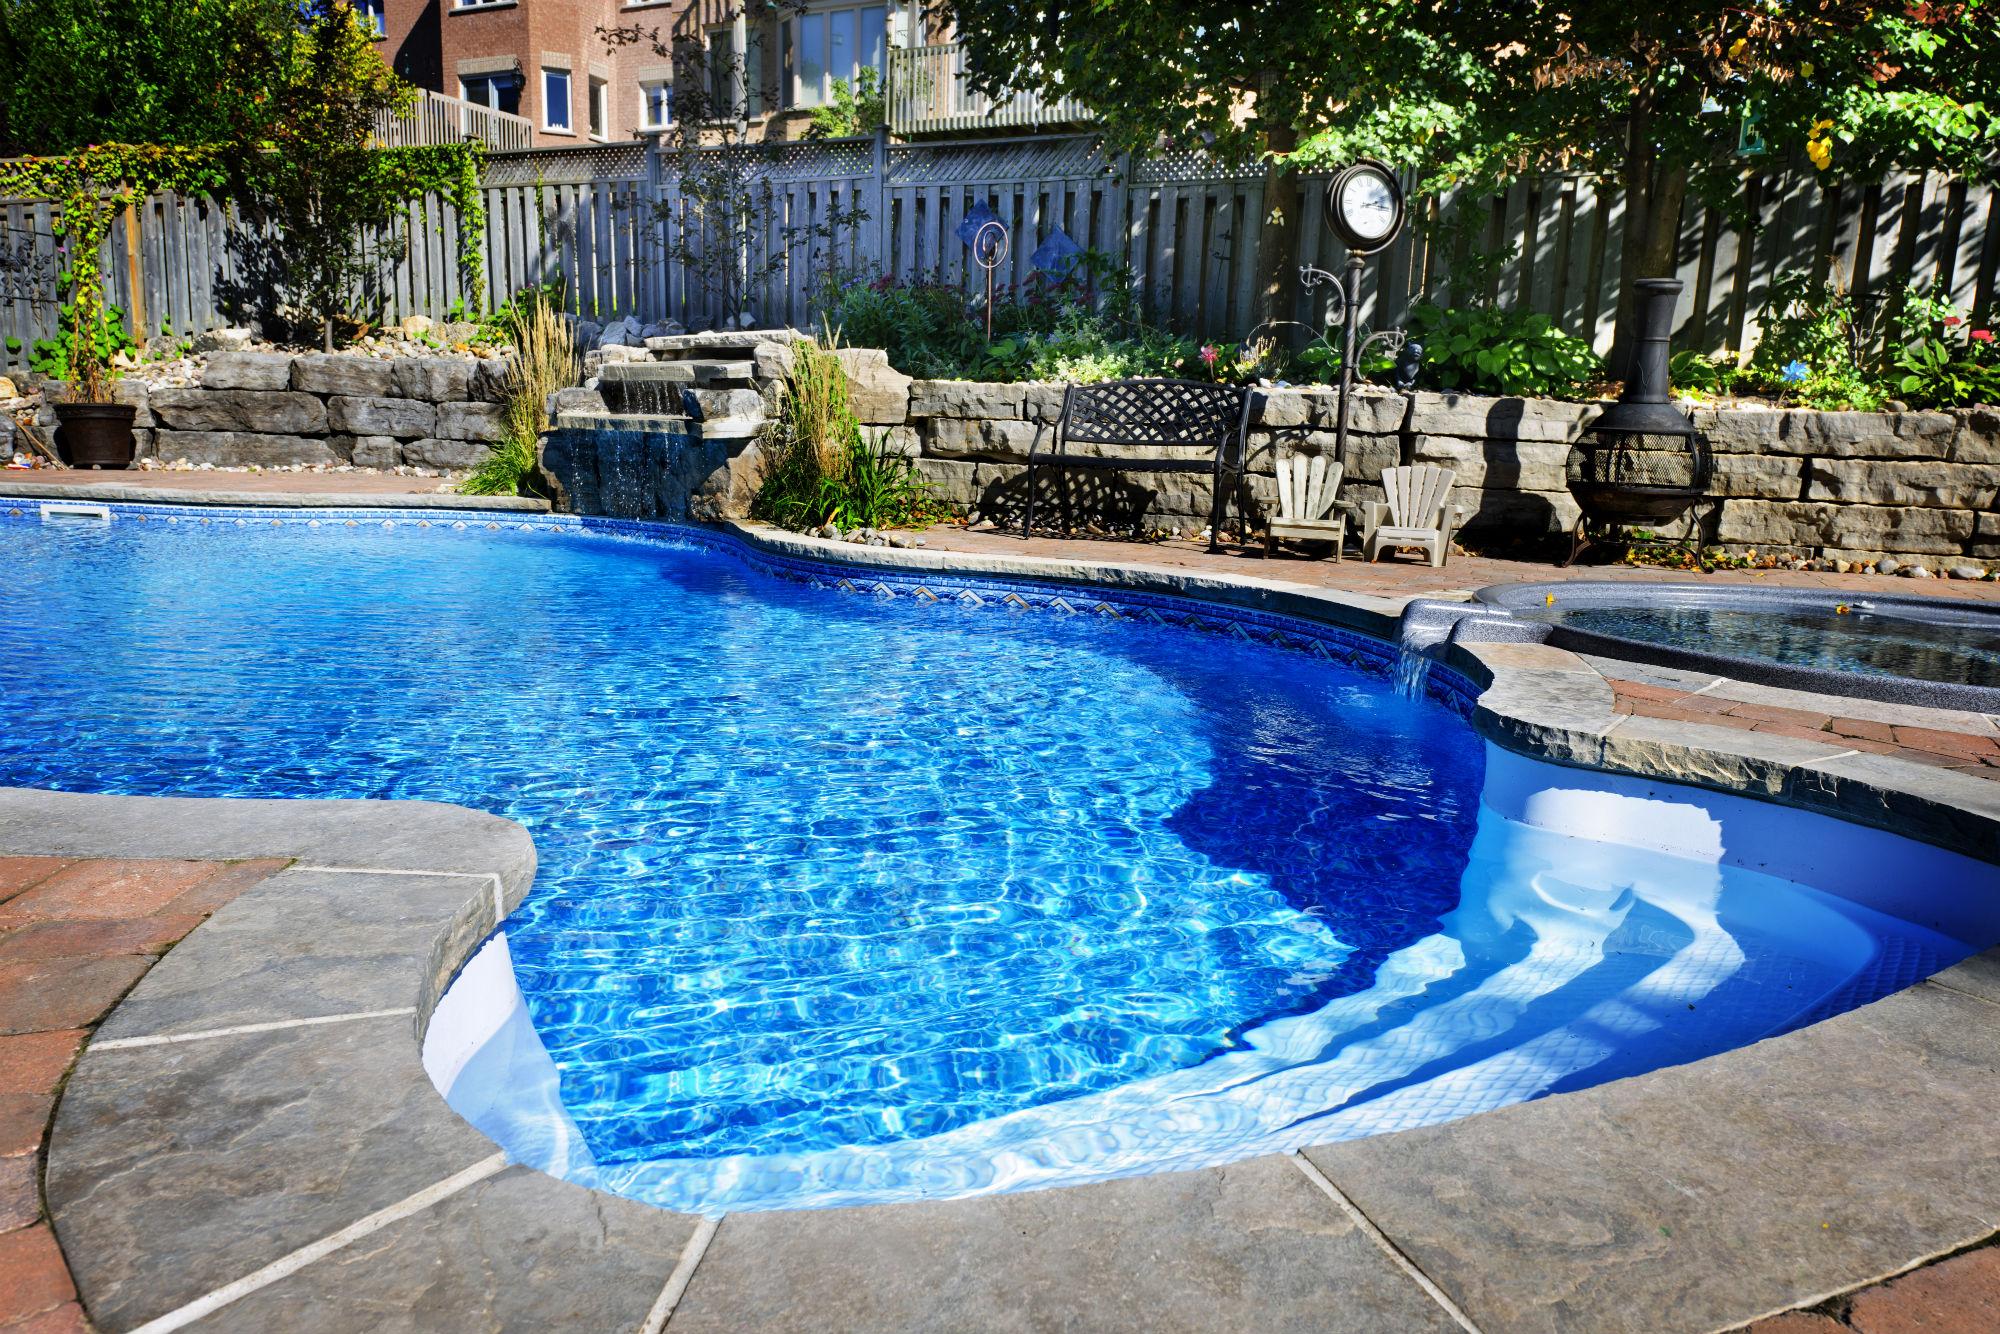 Normas para o uso da piscinas nos condomínios podem causar polêmica